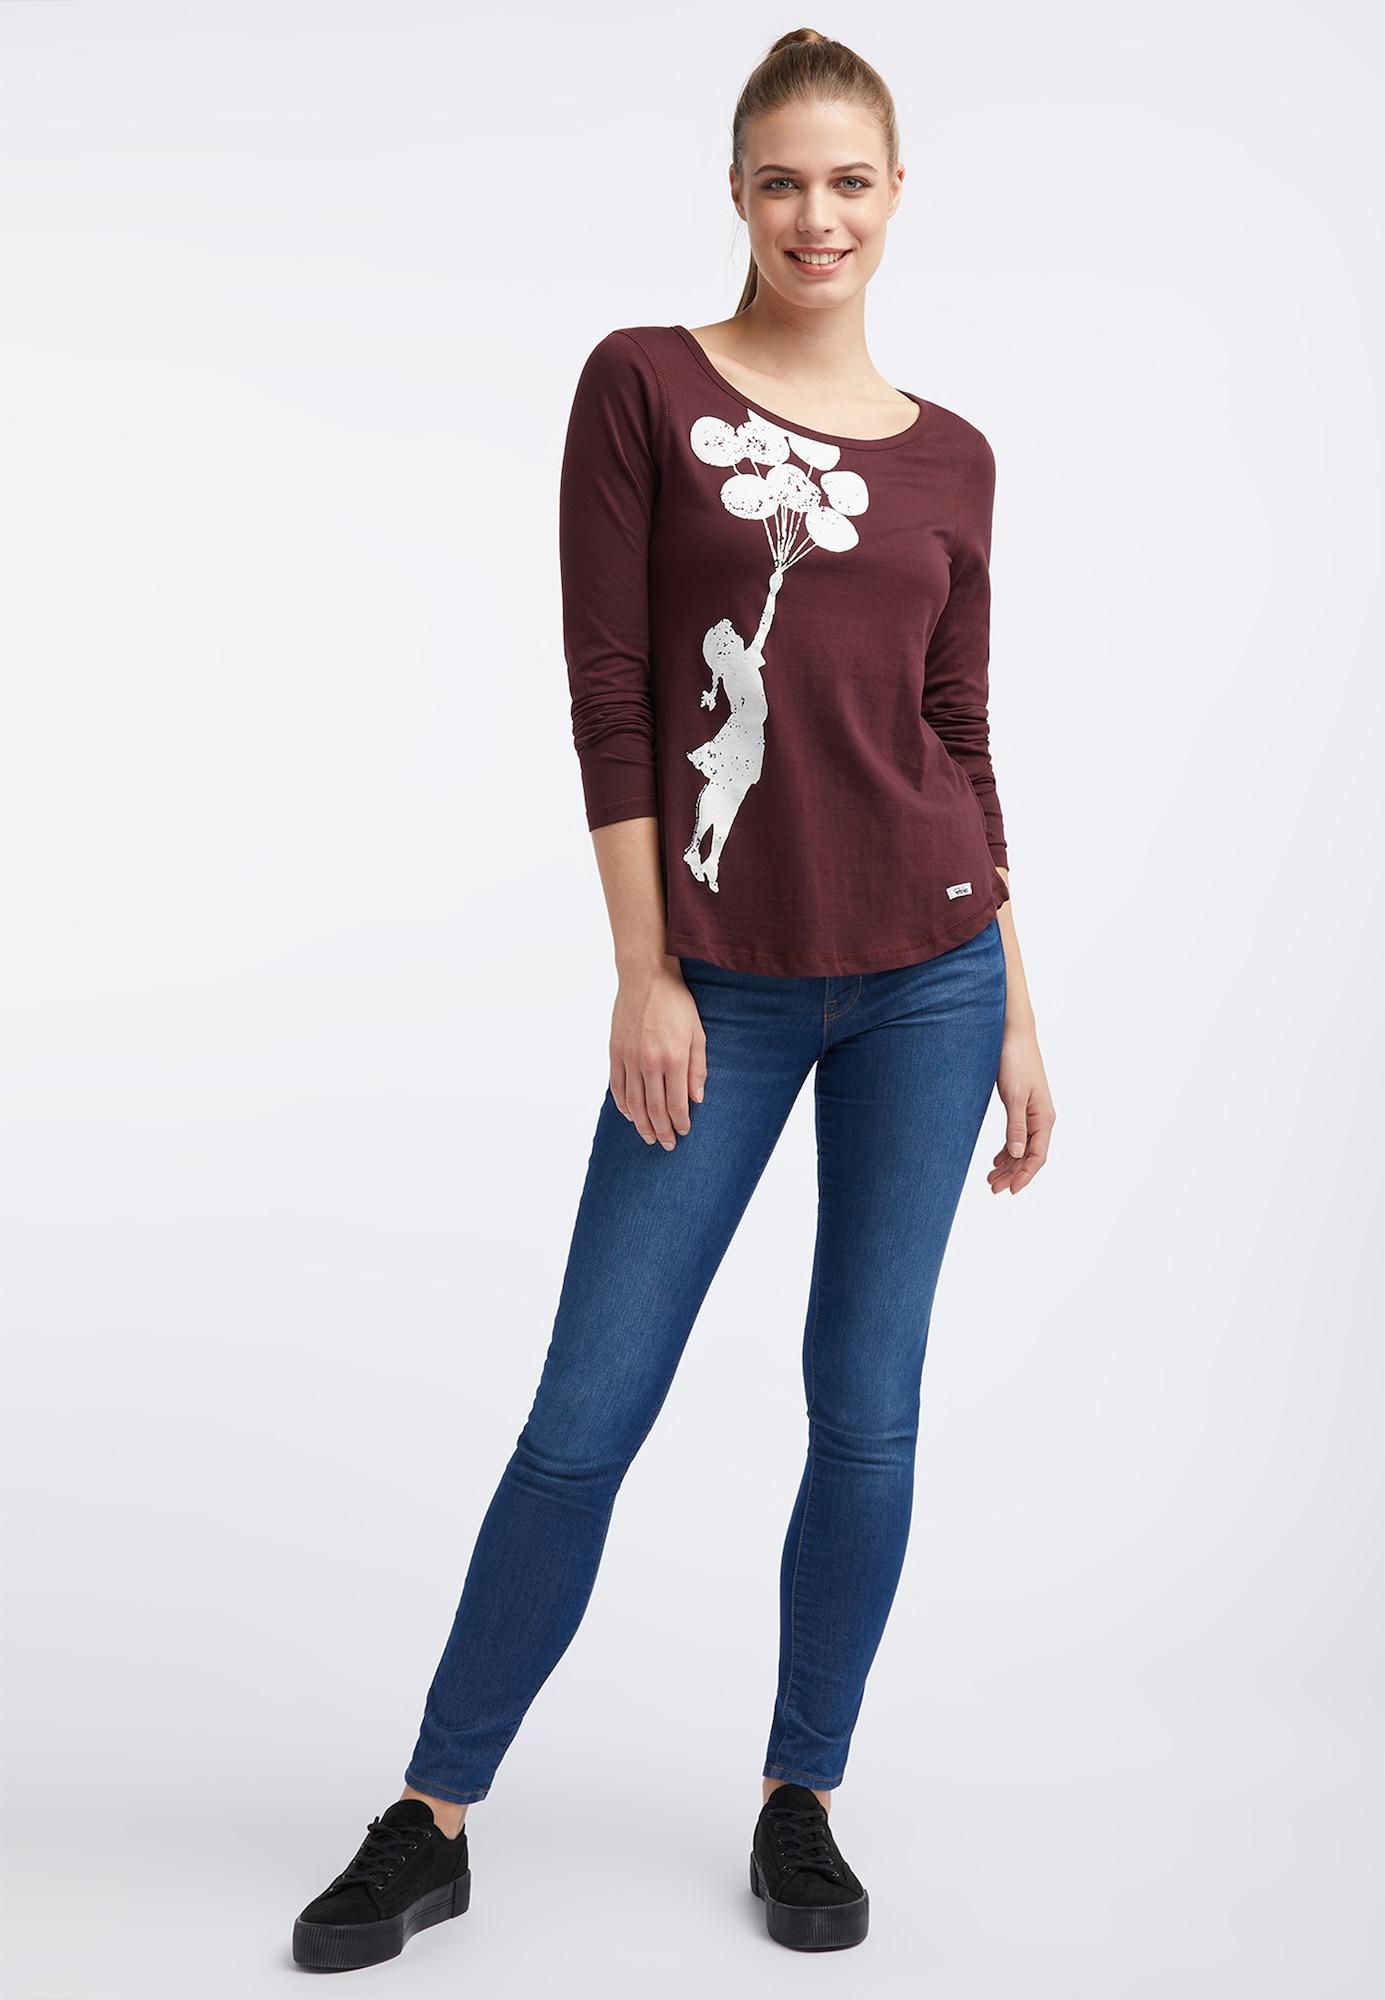 HOMEBASE, Damen Shirt, roodviolet / rood gemêleerd / wit